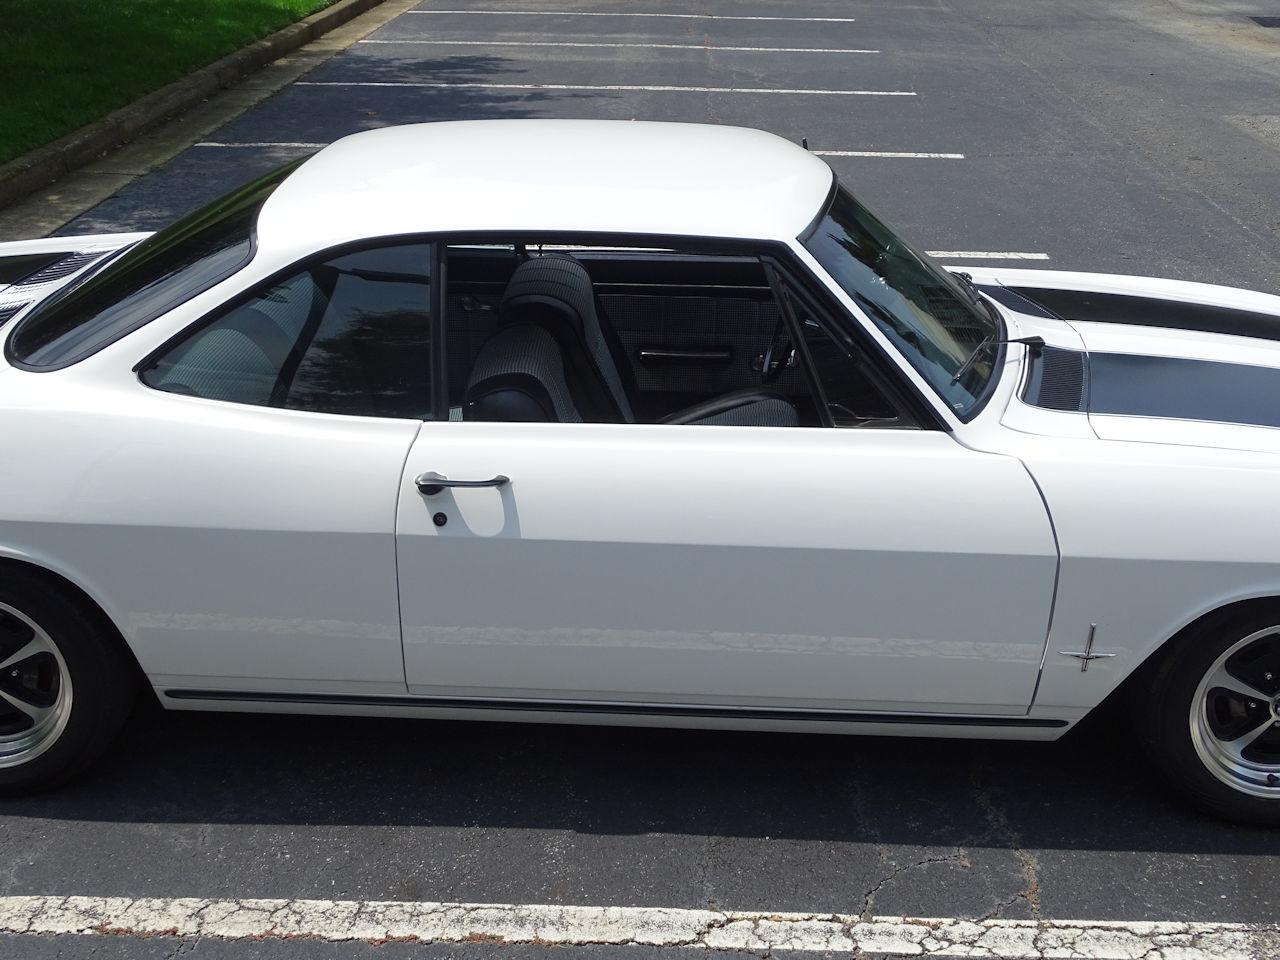 1966 Chevrolet Corvair 56